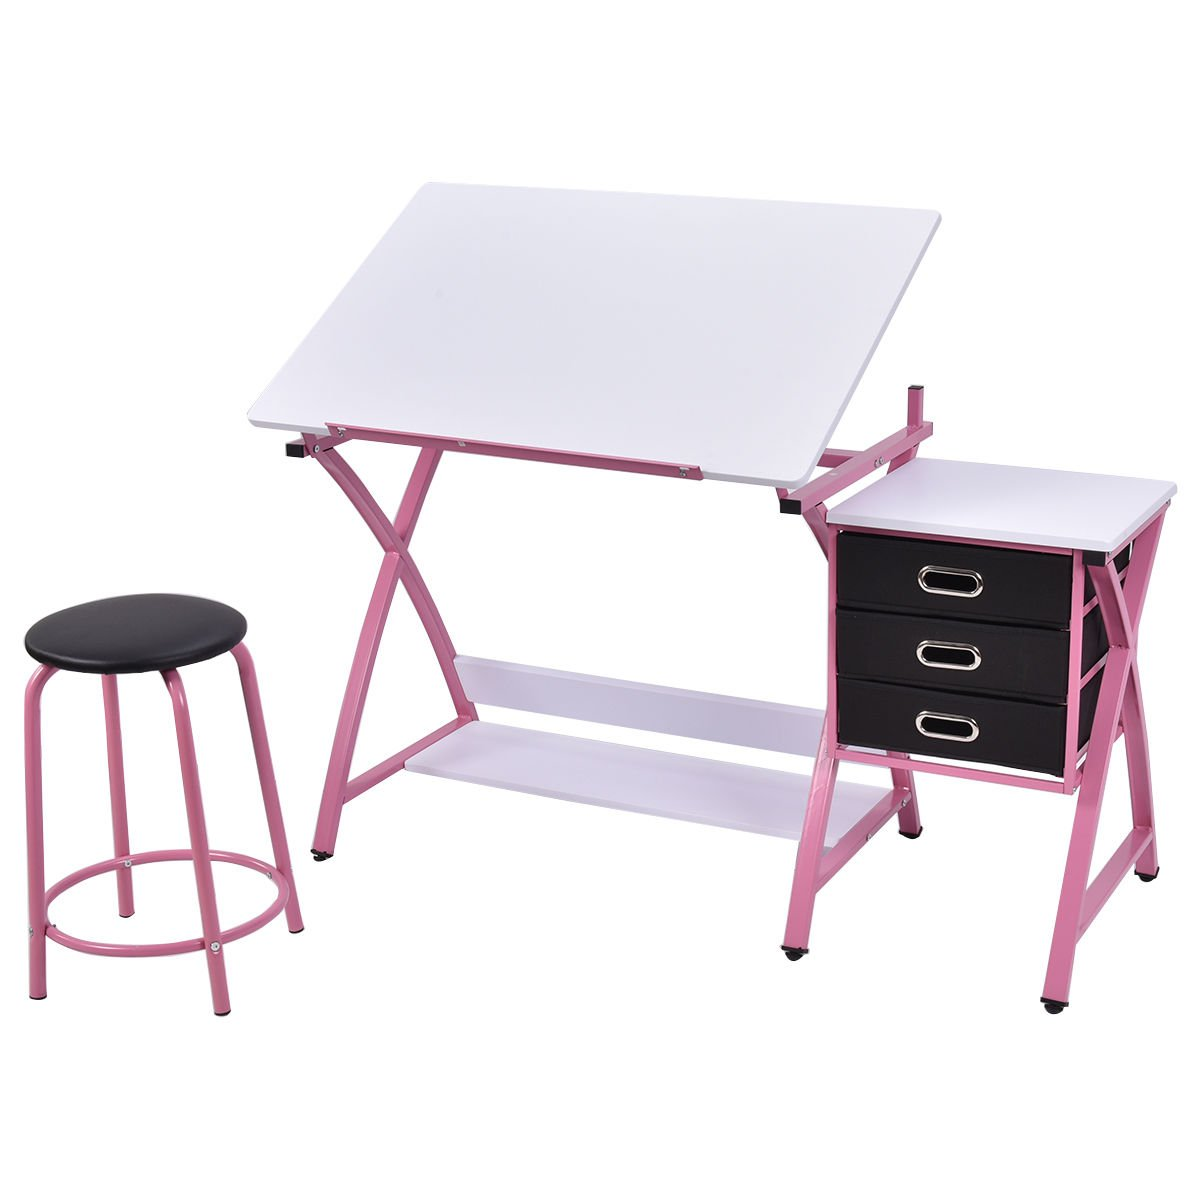 Tangkula Drafting Table Art & Craft Drawing Desk Art Hobby Folding Adjustable w/Stool (Pink)